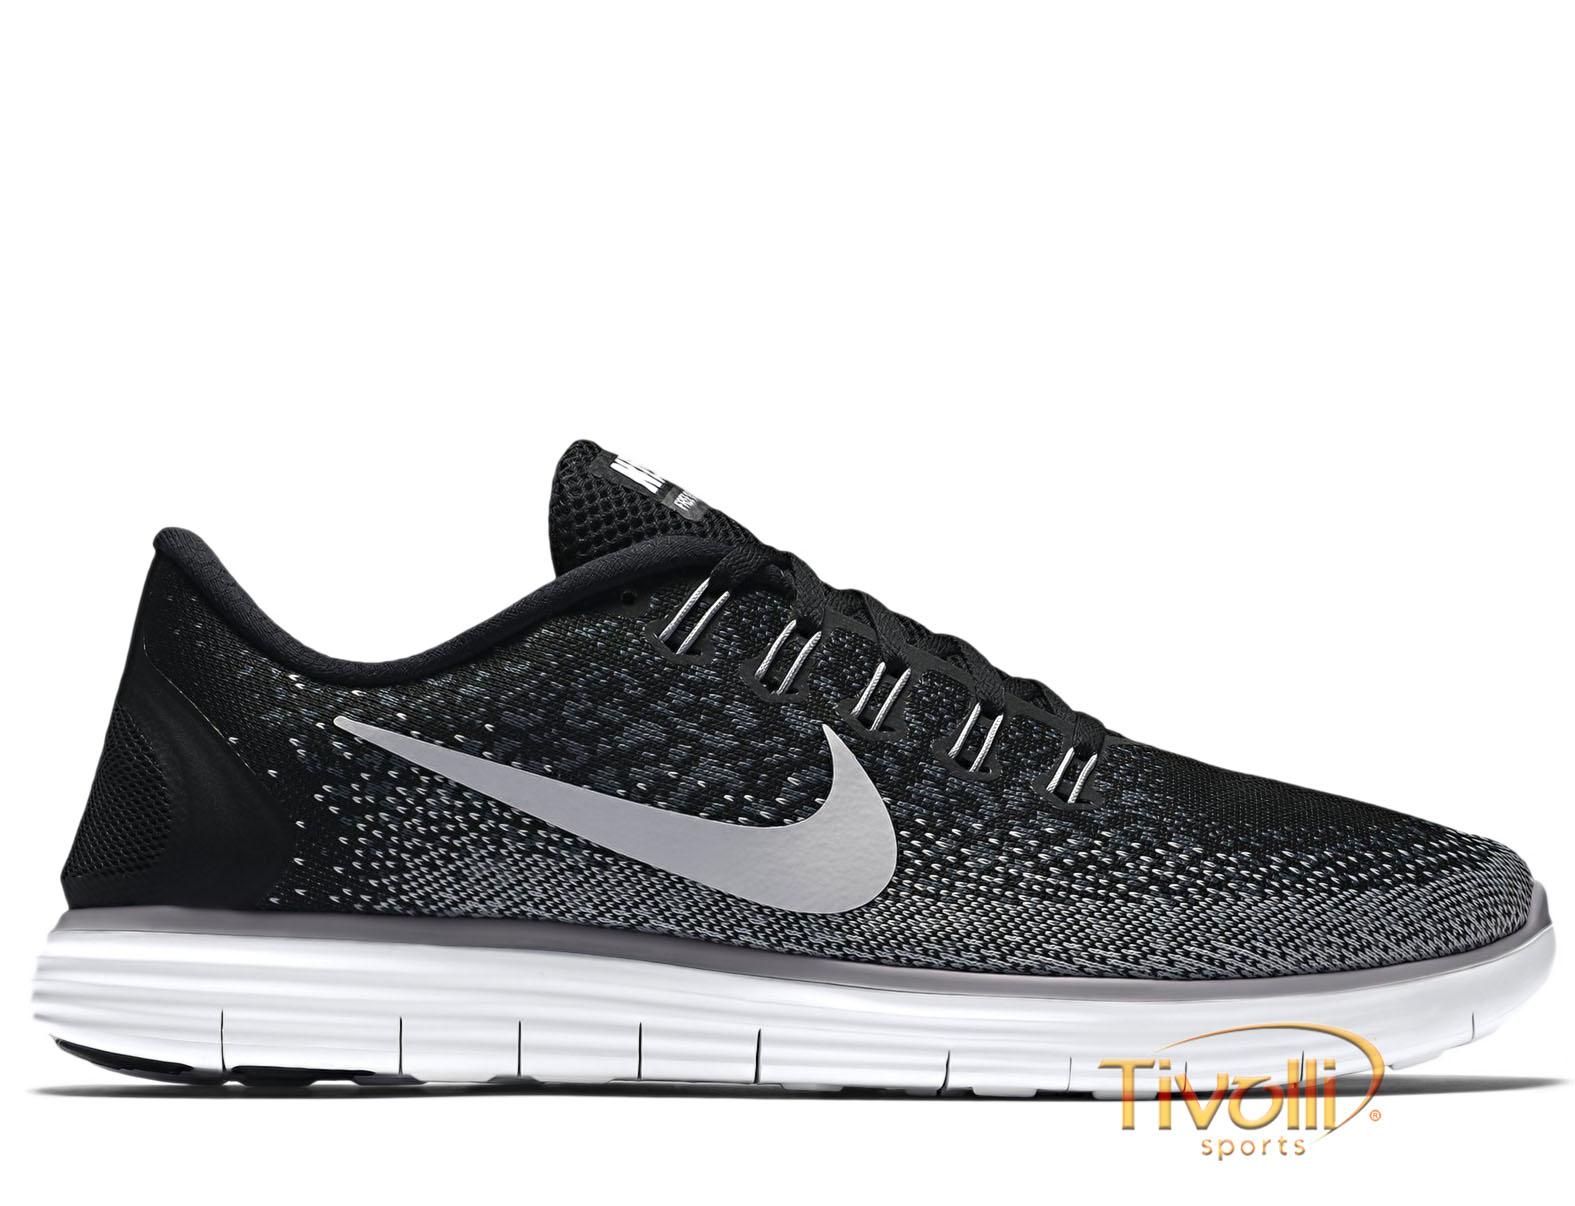 033e647d4cf Raquete Mania   Tênis Nike Free Run RN Distance   Masculino Preto ...